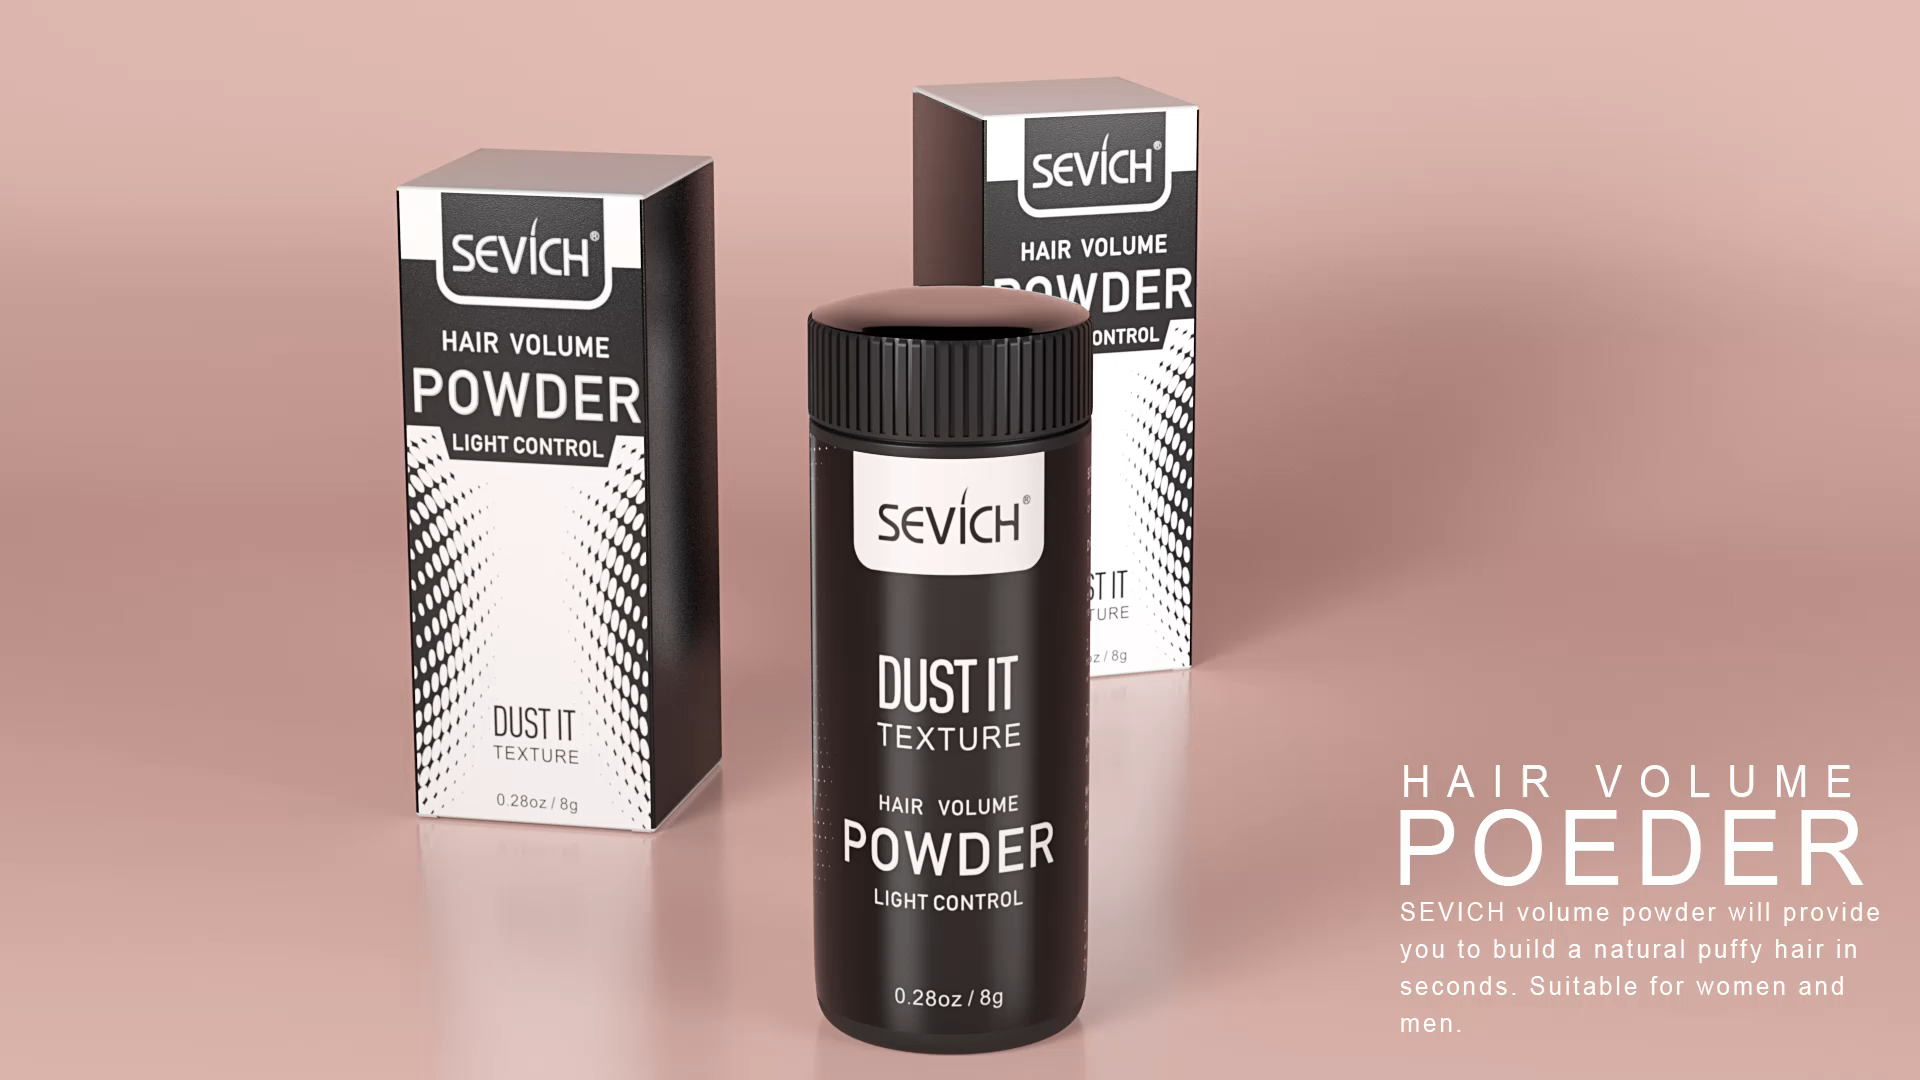 Polvo de volumen de pelo de raíz mágica mate, productos para cabello graso y textura